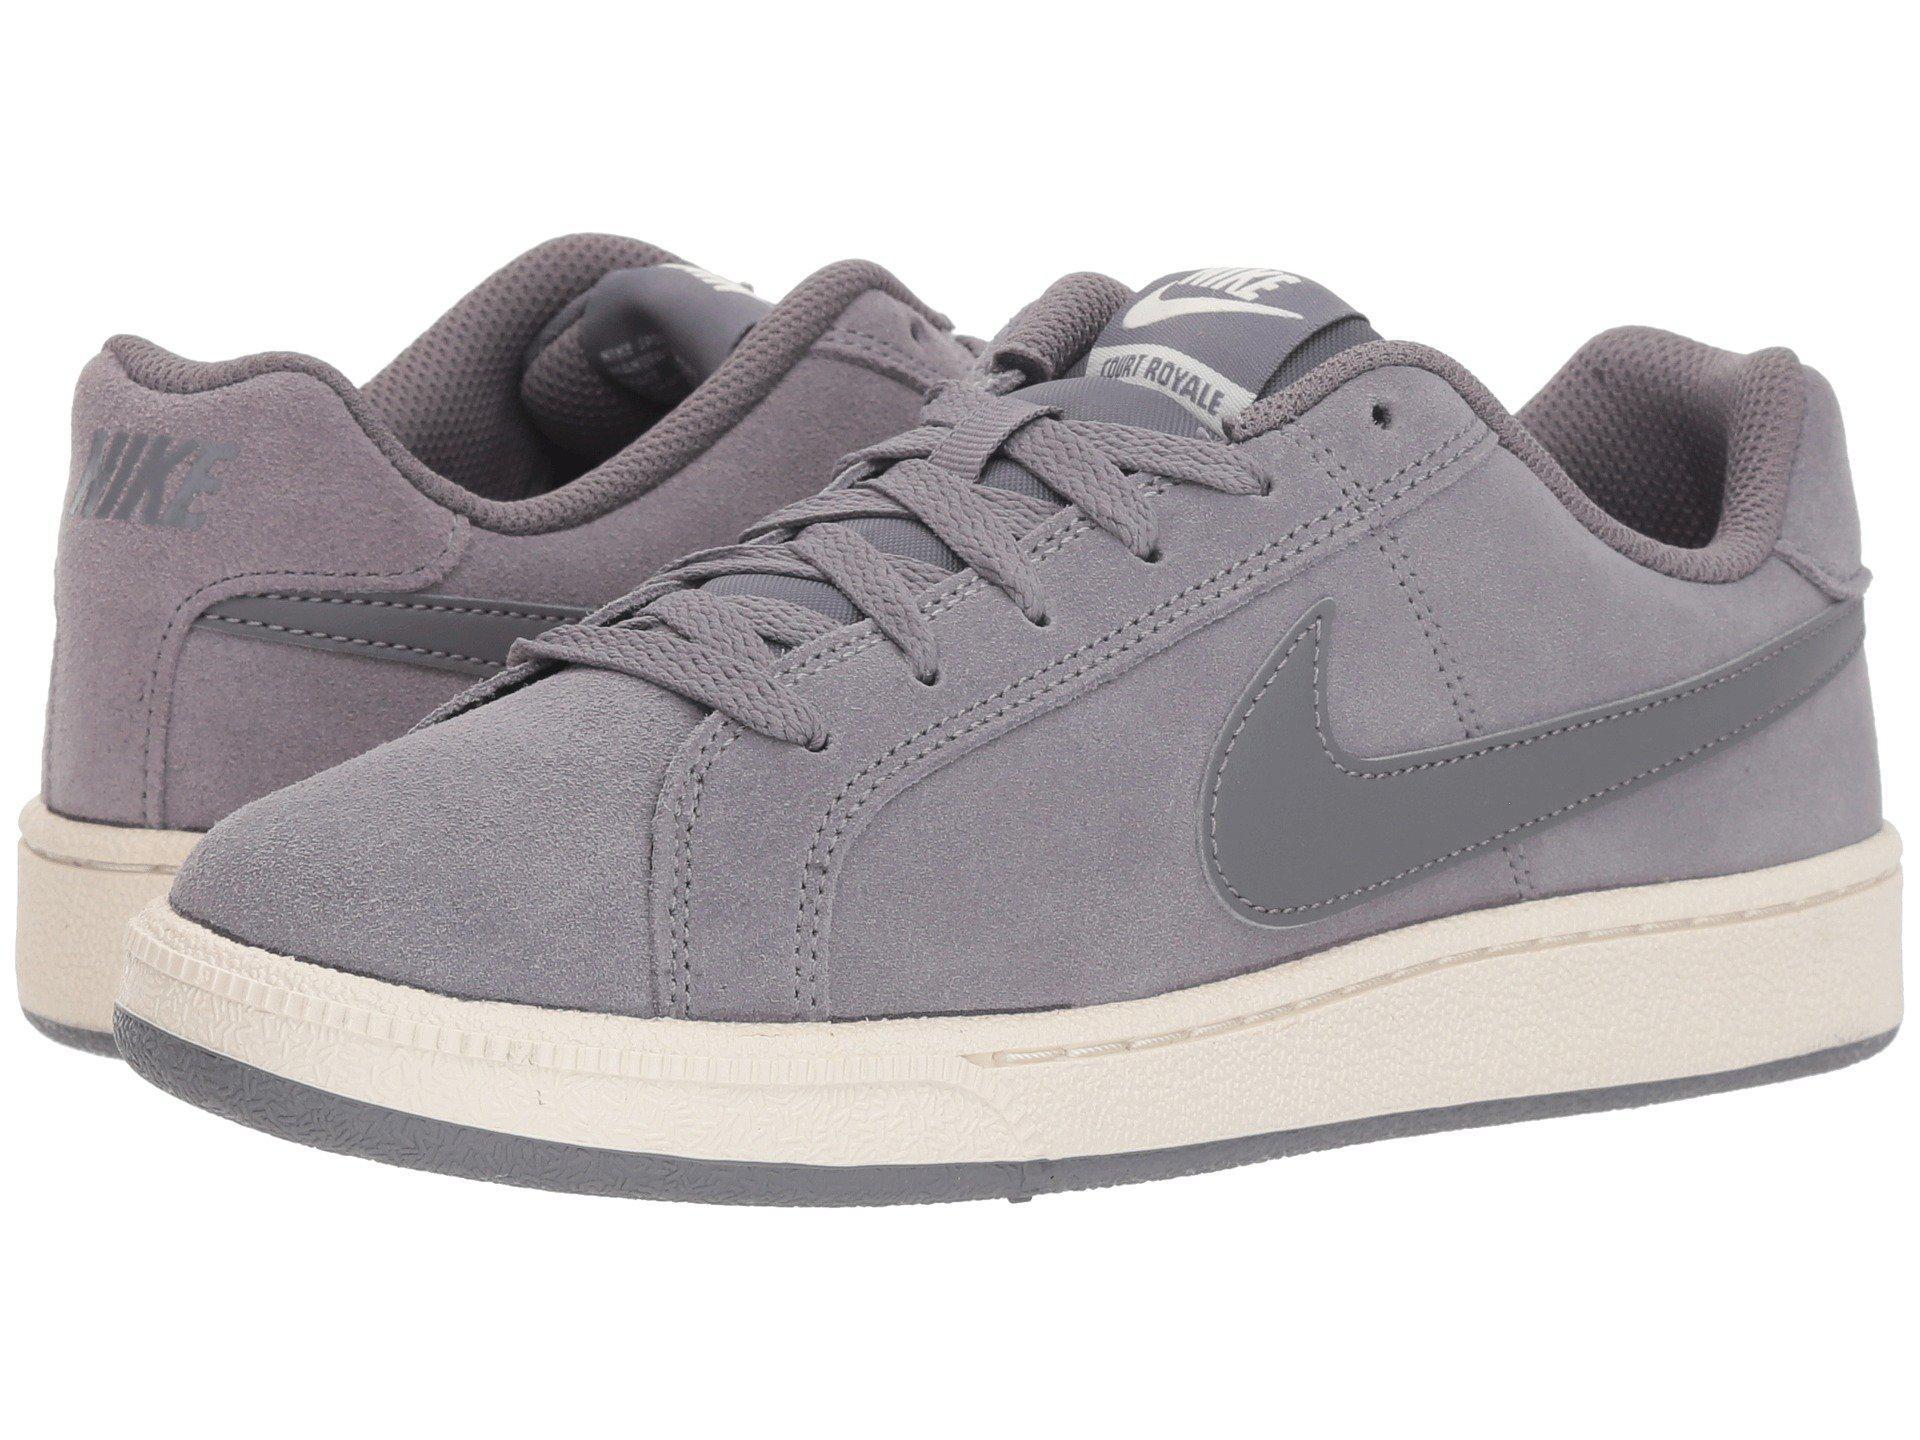 Lyst - Nike Court Royale Suede (black black thunder Grey) Women s ... a79f3645c